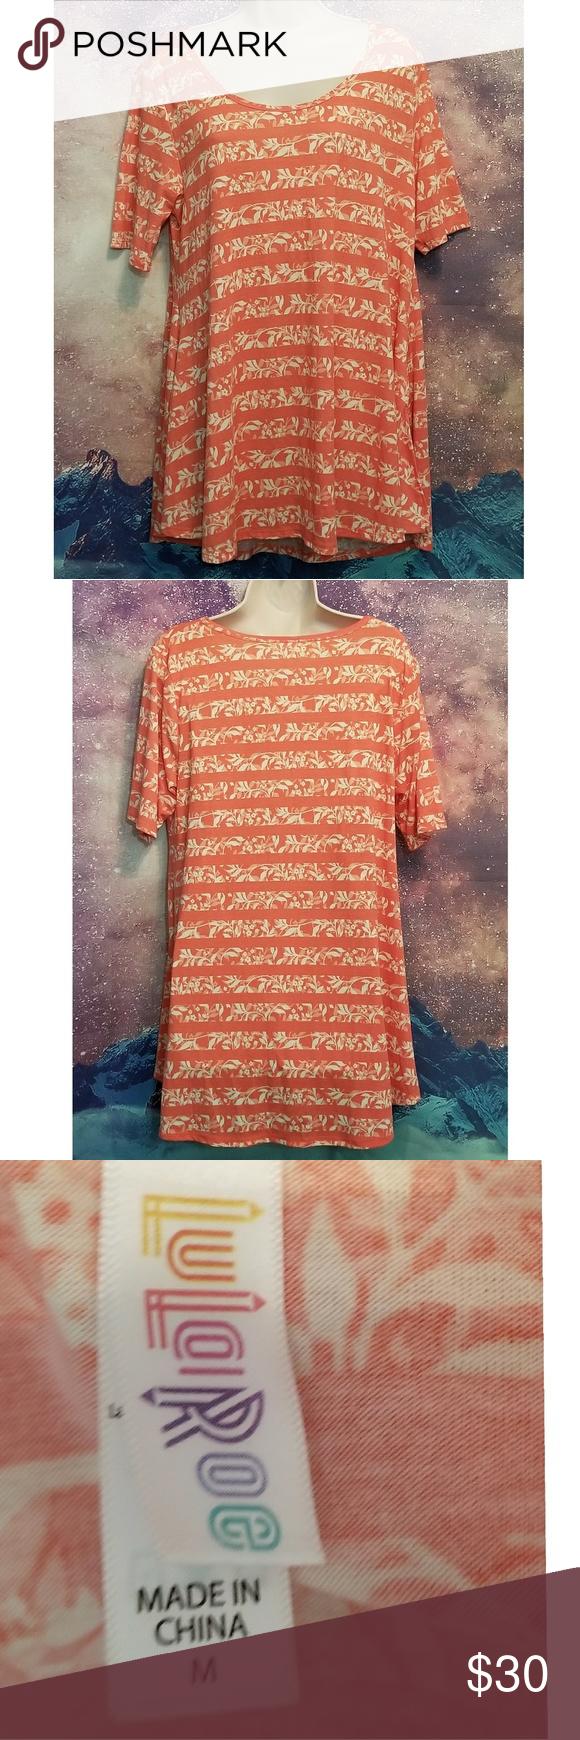 Lularoe Perfect T-shirt Excellent Condition Size Mediun LuLaRoe Tops Tees - Short Sleeve